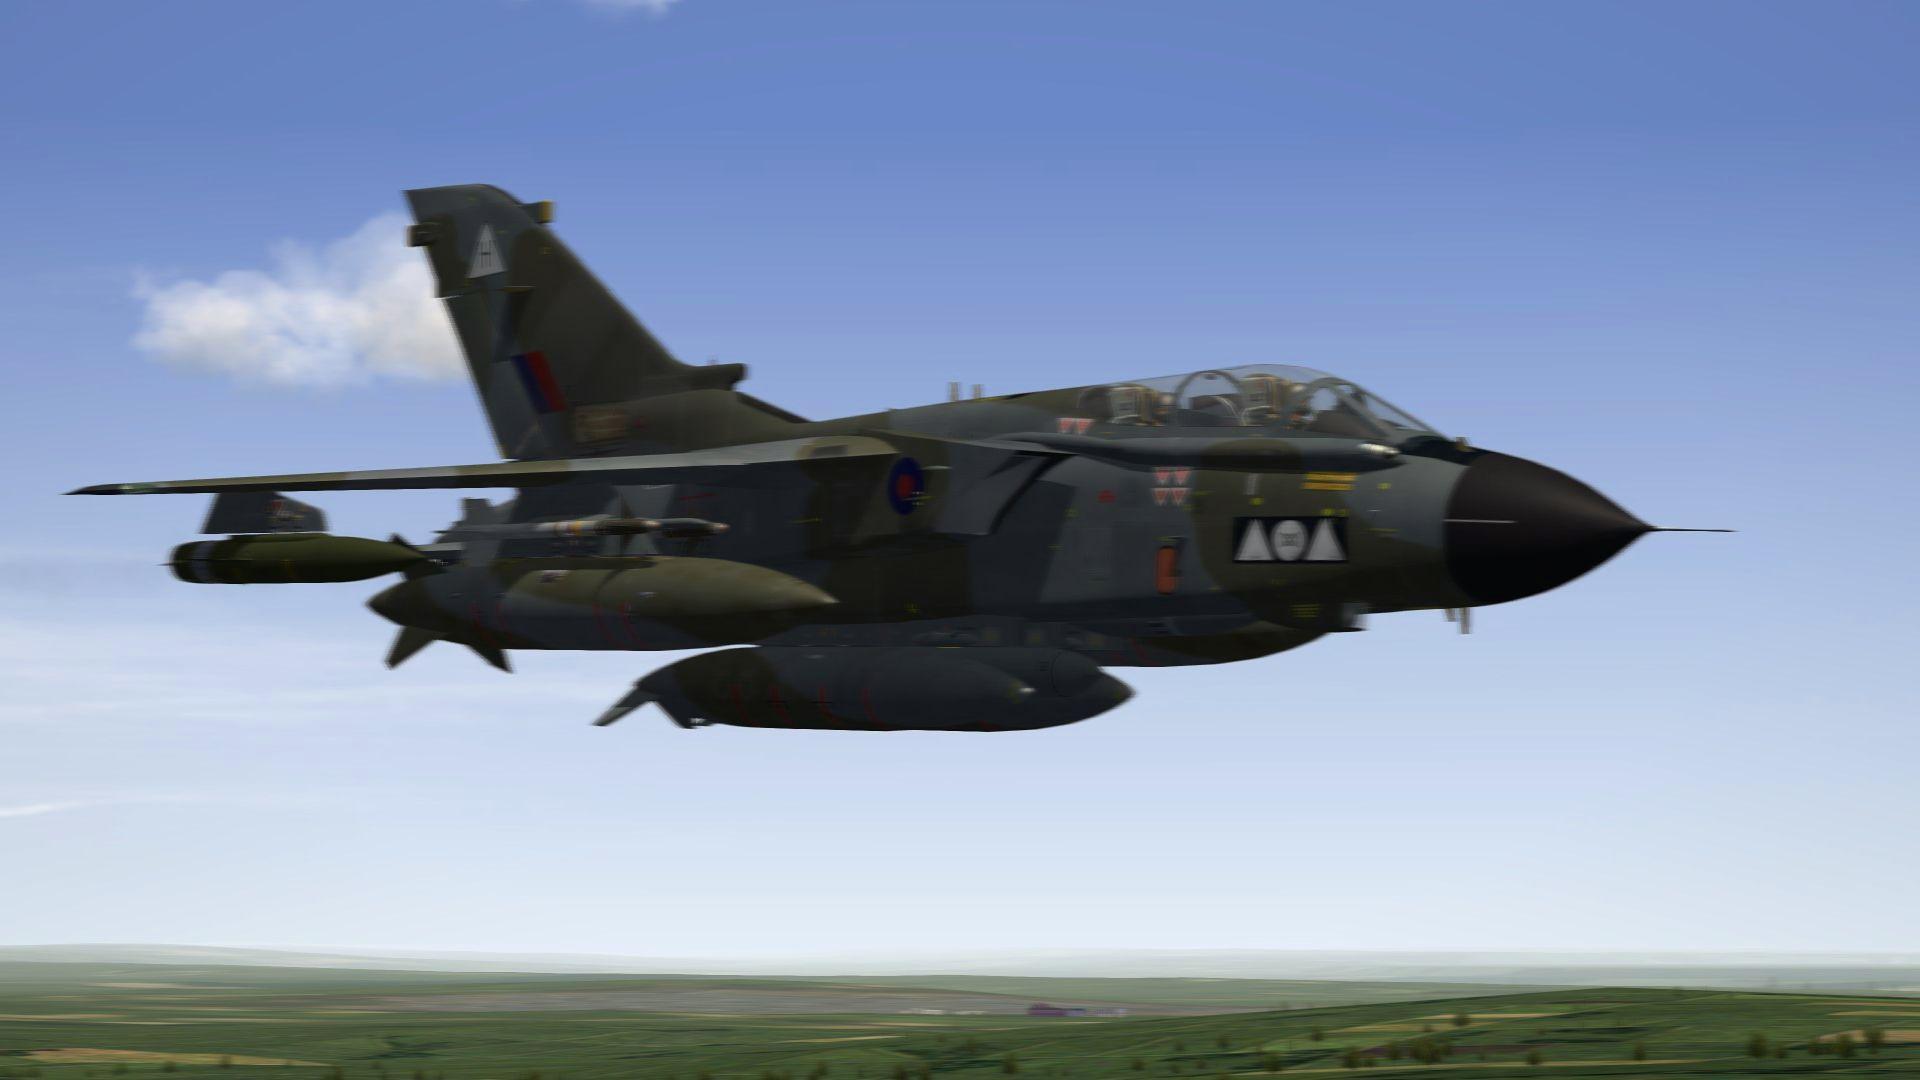 RAF%20TORNADO%20GR1A.02_zpsewnsgyxp.jpg